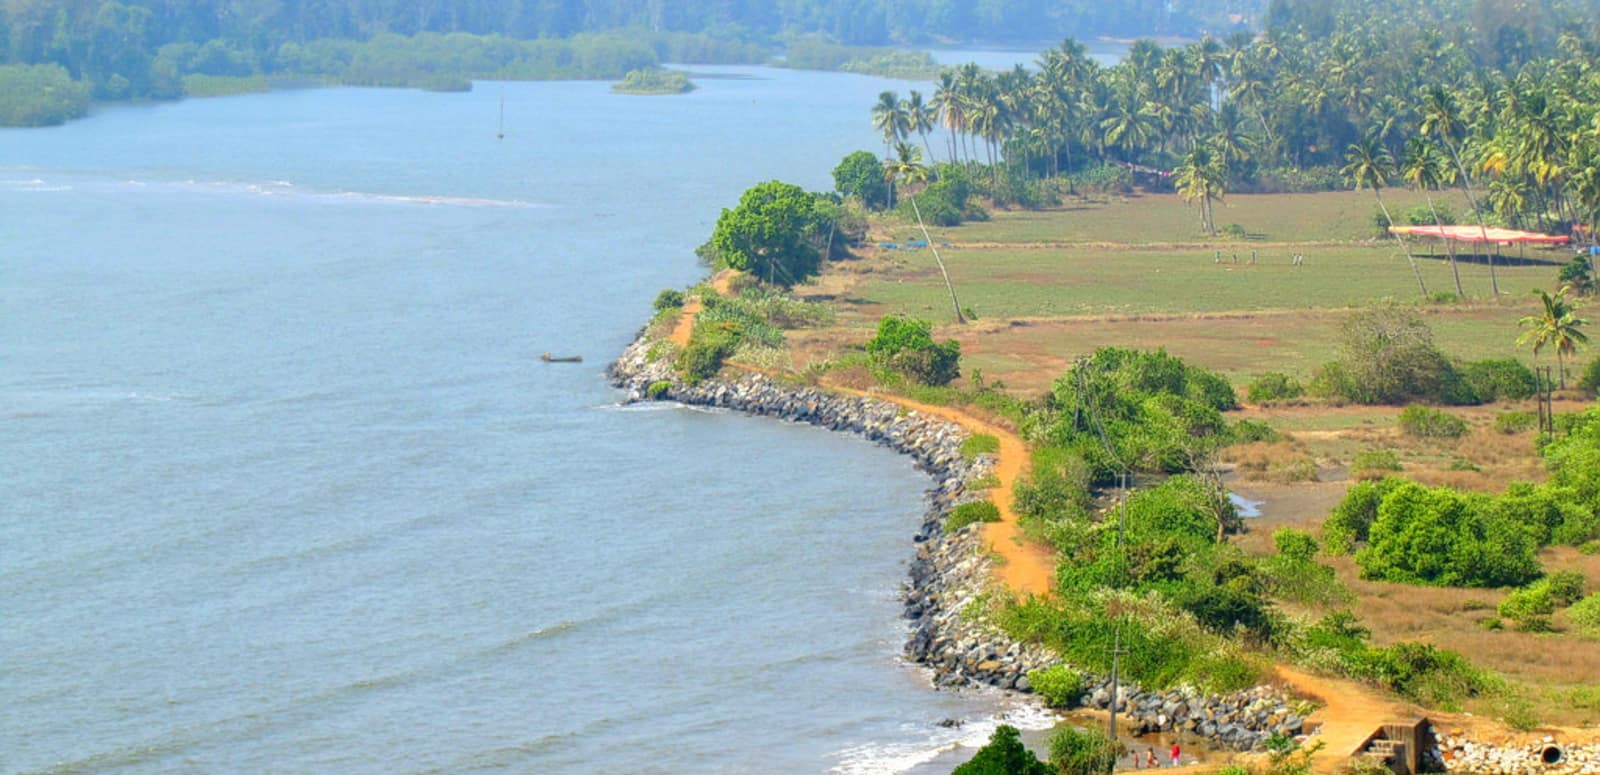 1492596674_kali_river_karwar_karnataka_india.jpg